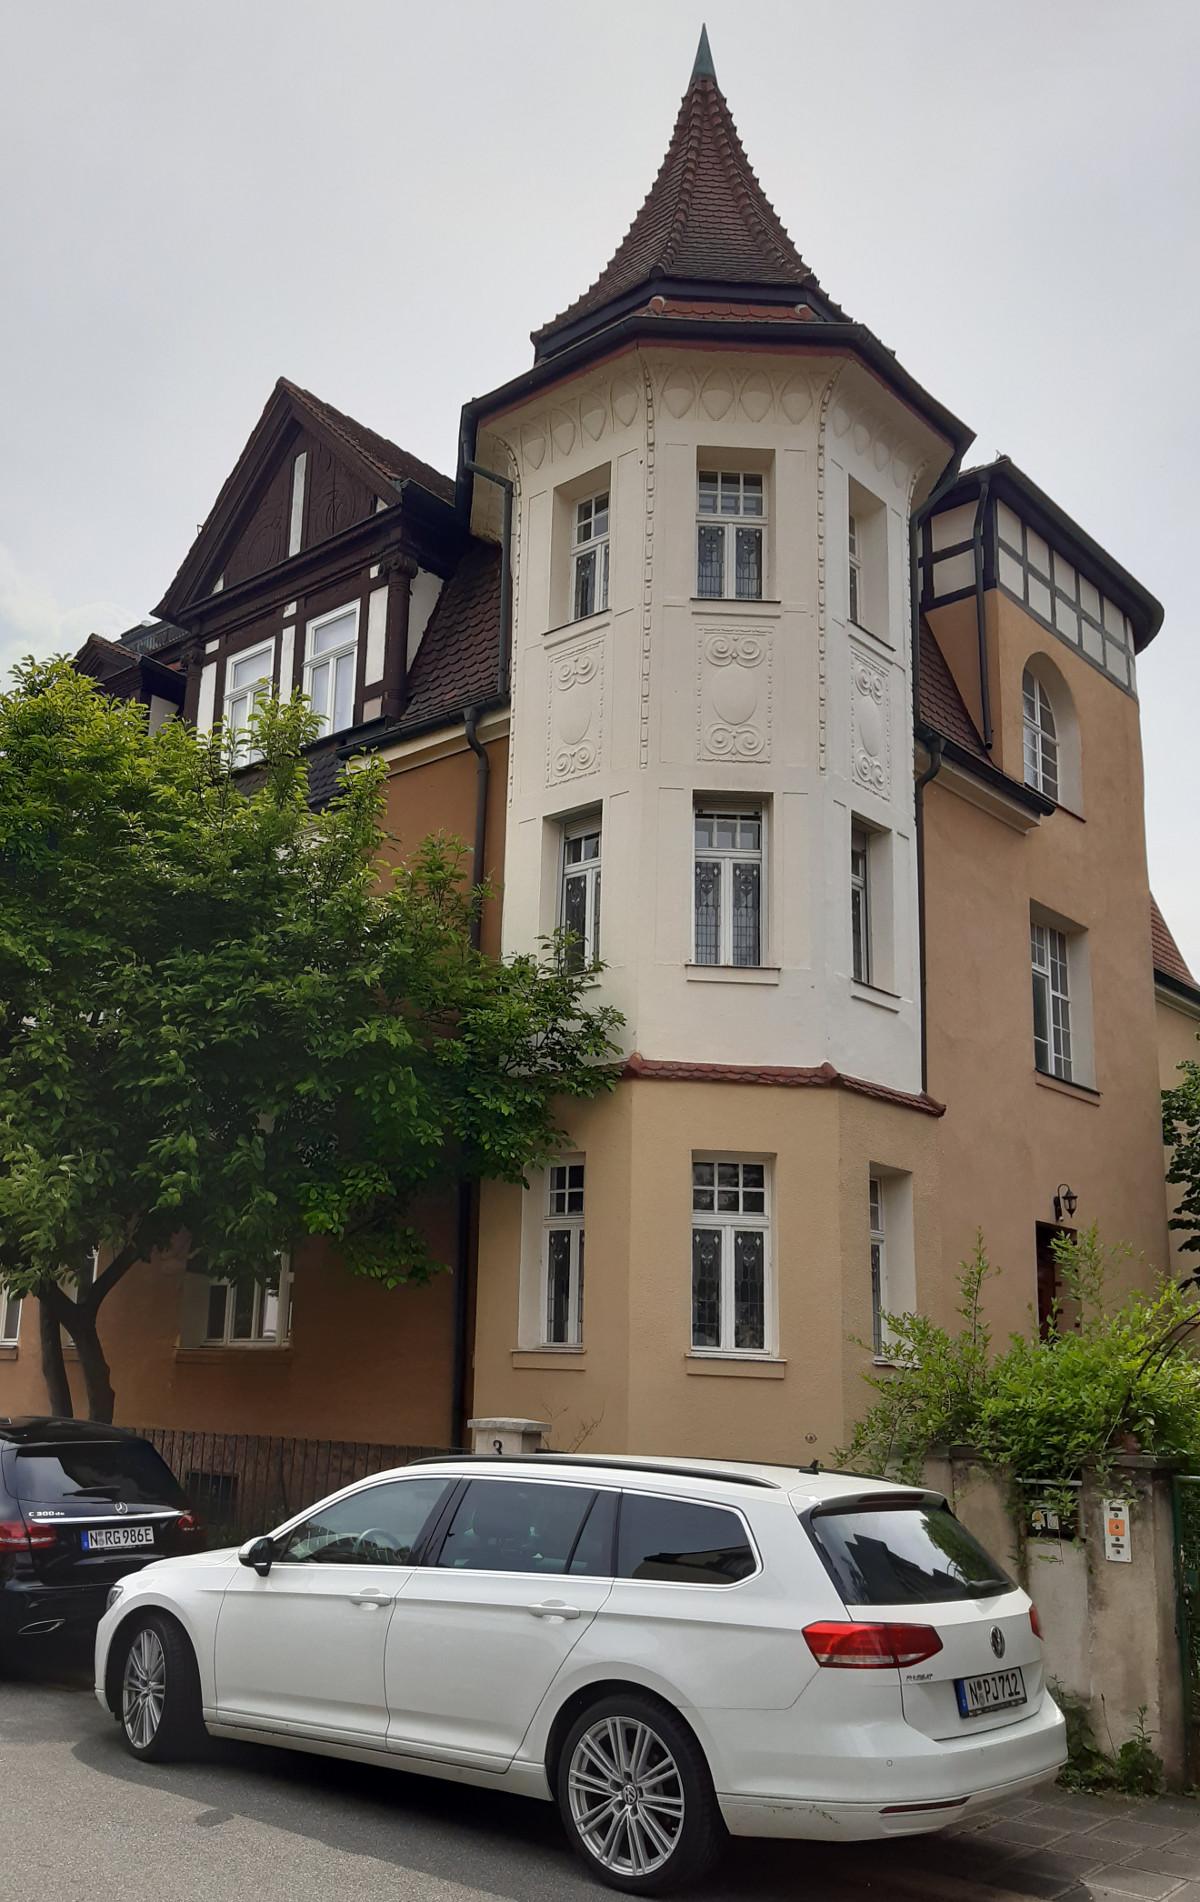 2021-06-16-01-21-18-4VillaLutzstrasse.jpg - Atelier Haberbosch Nürnberg